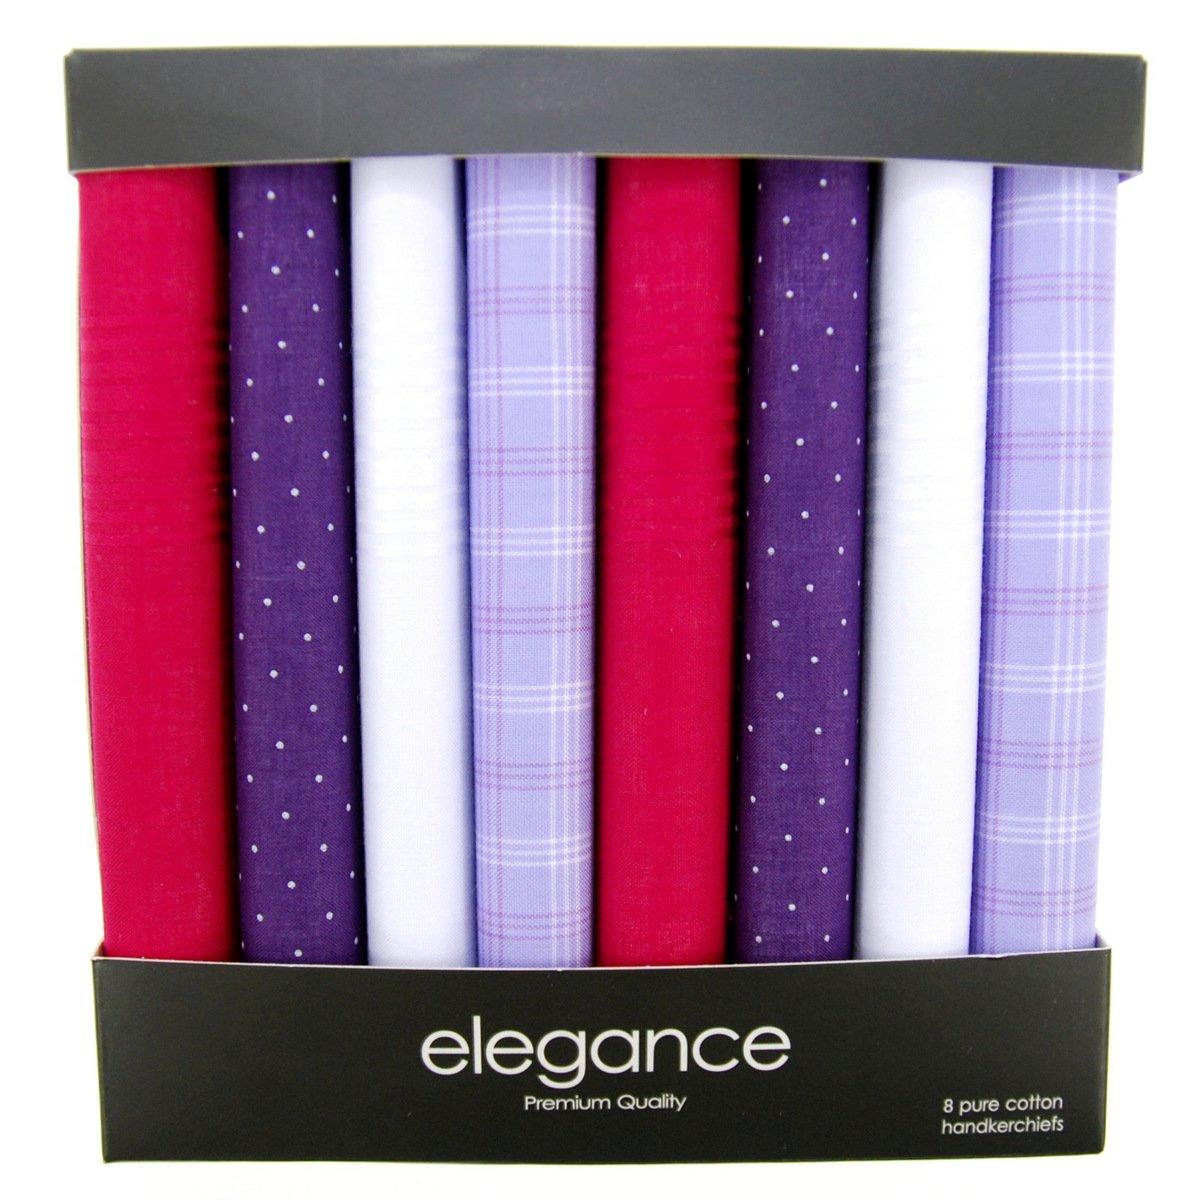 Retreez 8 Piece Pure Cotton Assorted Men's Handkerchiefs Hanky Gift Box Set Christmas gift - White RTZ-HNK8BOX-0001-SET005